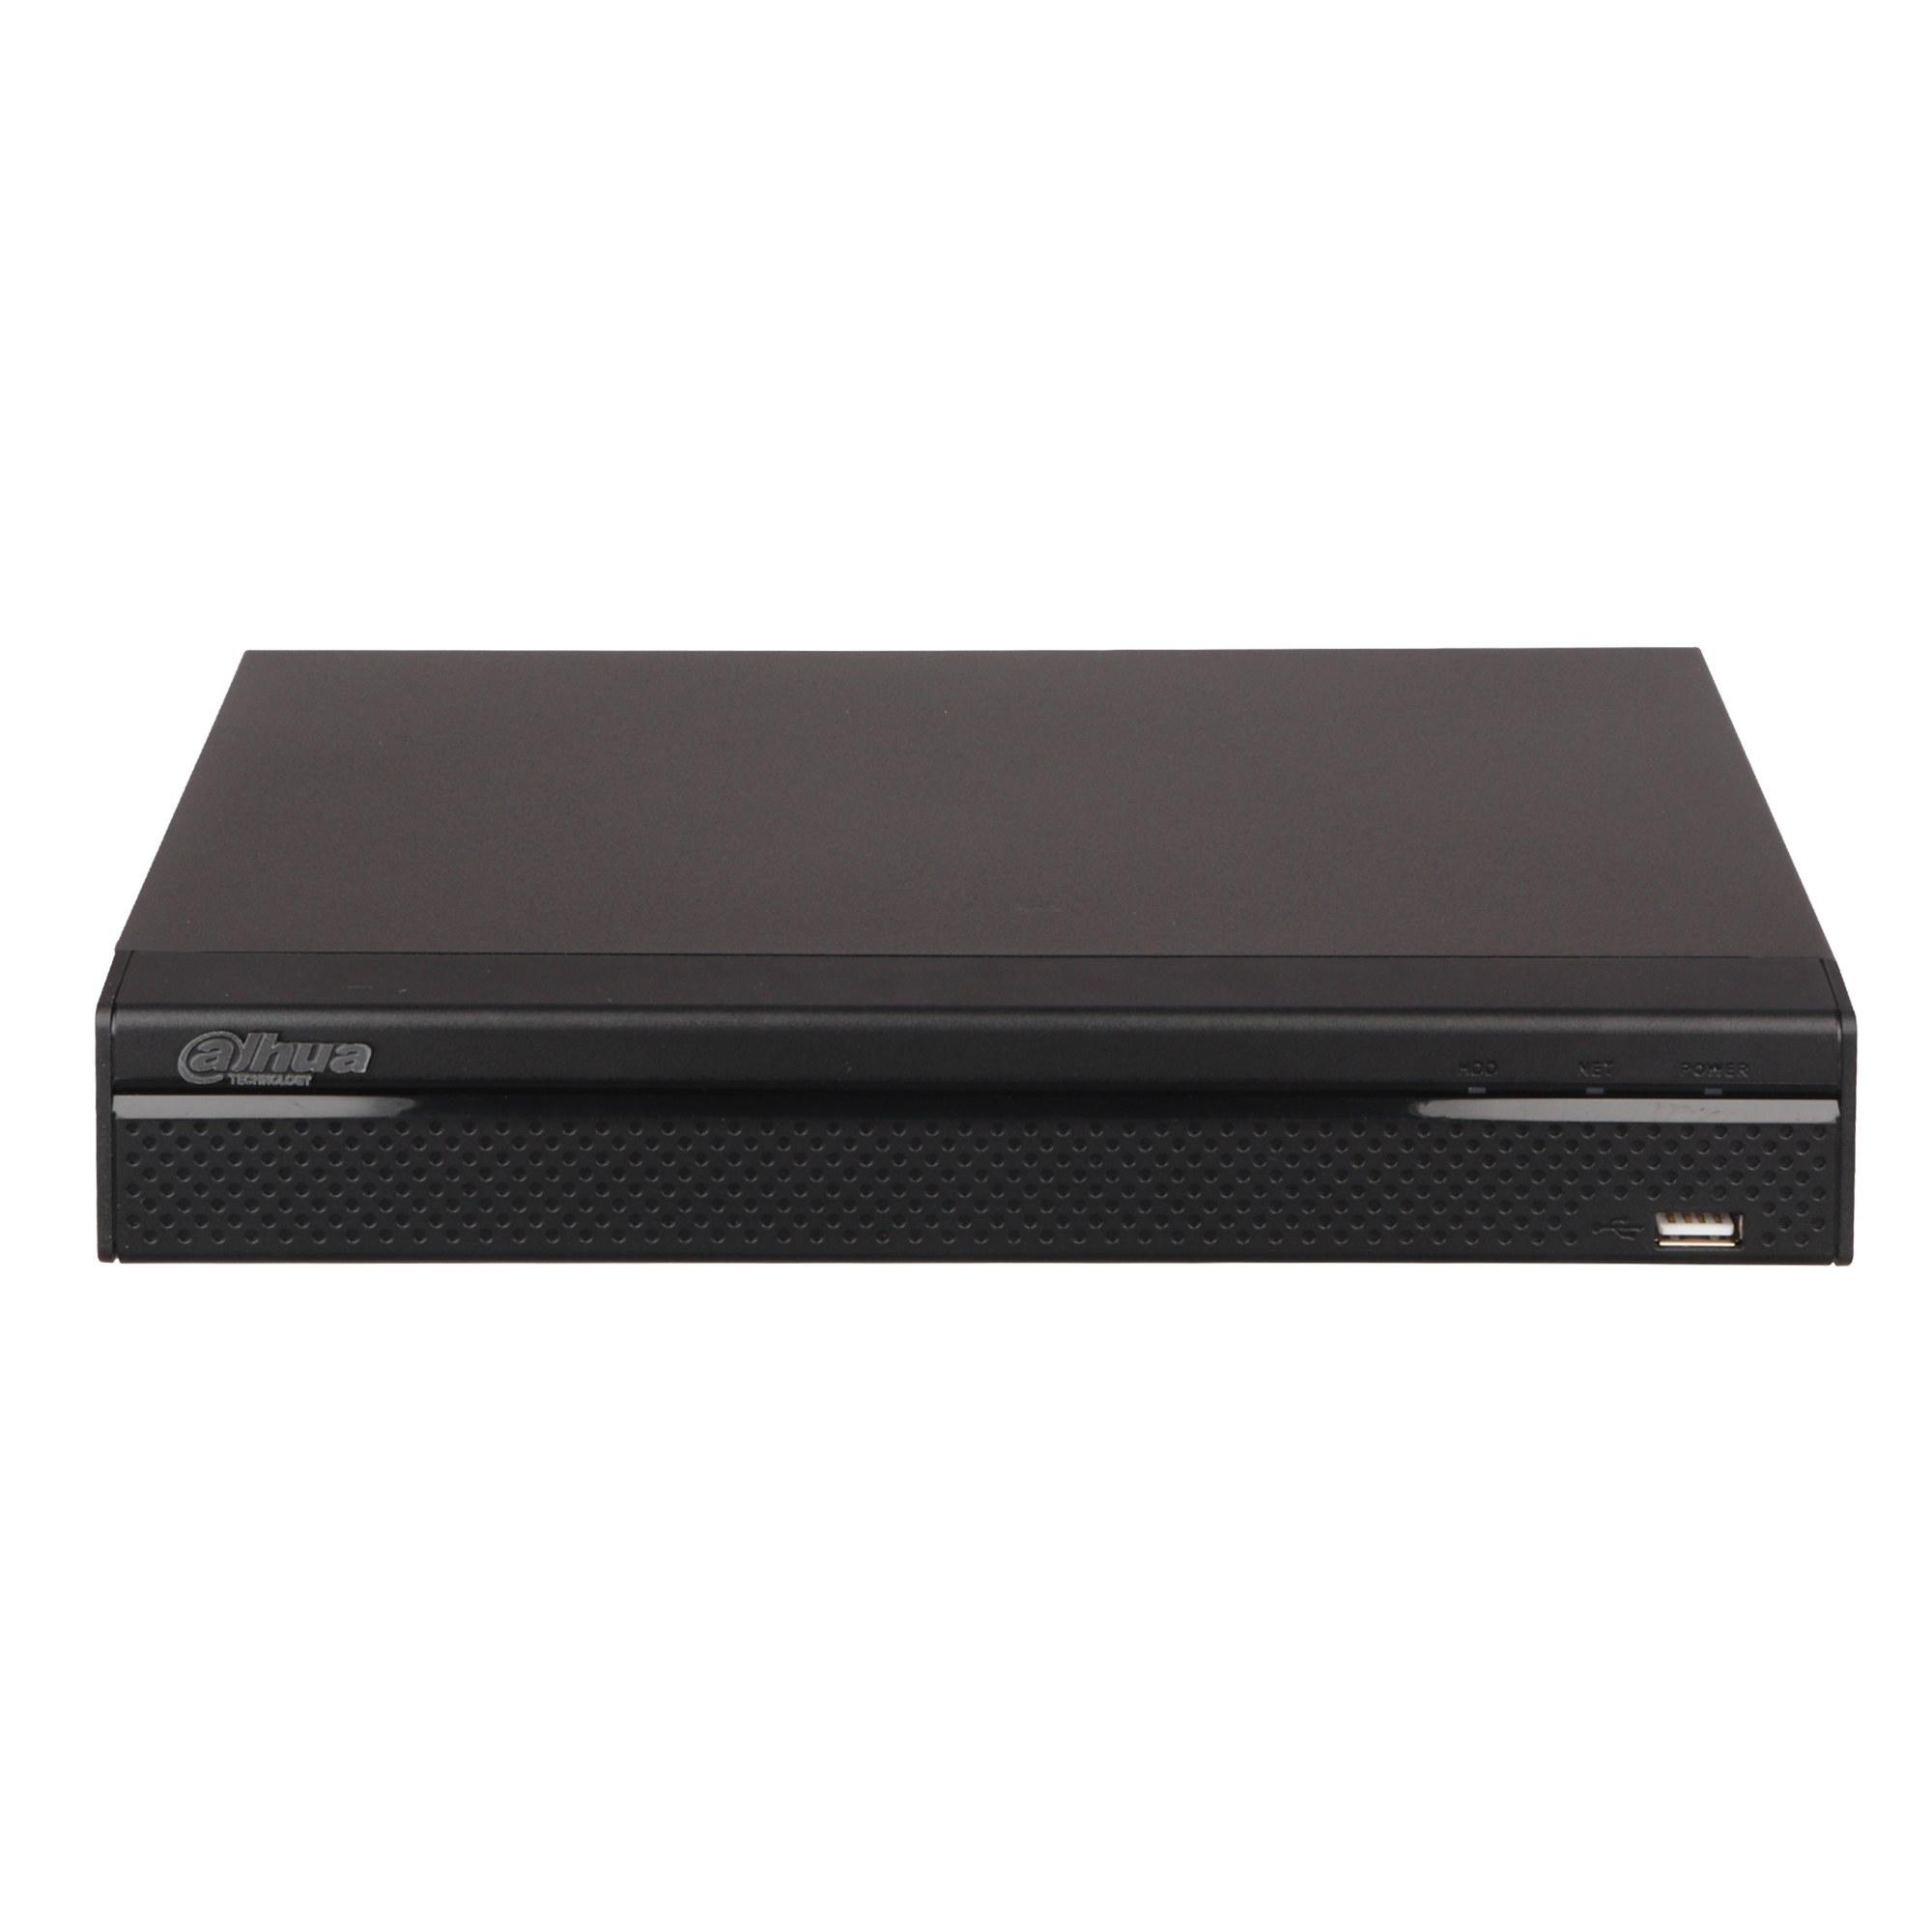 تصویر دستگاه داهوا مدل DH-XVR5104HS-X 4 Channel Penta-brid 1080P Compact 1U Digital Video Recorder